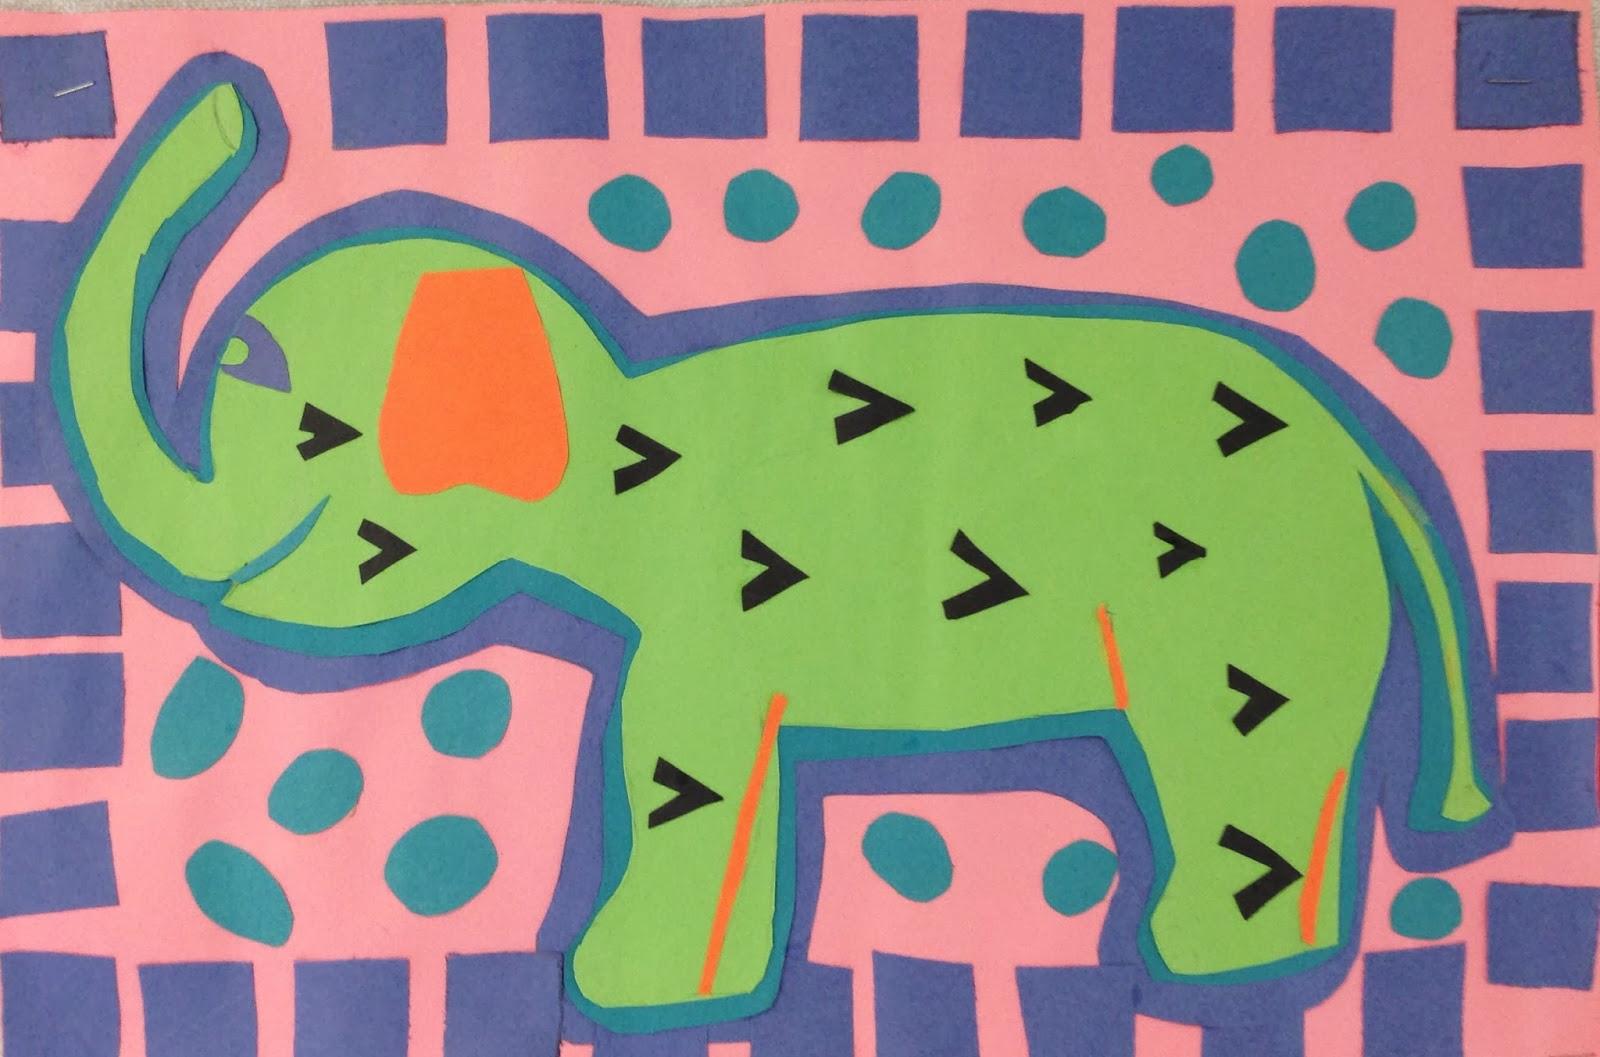 1000  images about paper mola art on Pinterest | West coast, Bobs ...